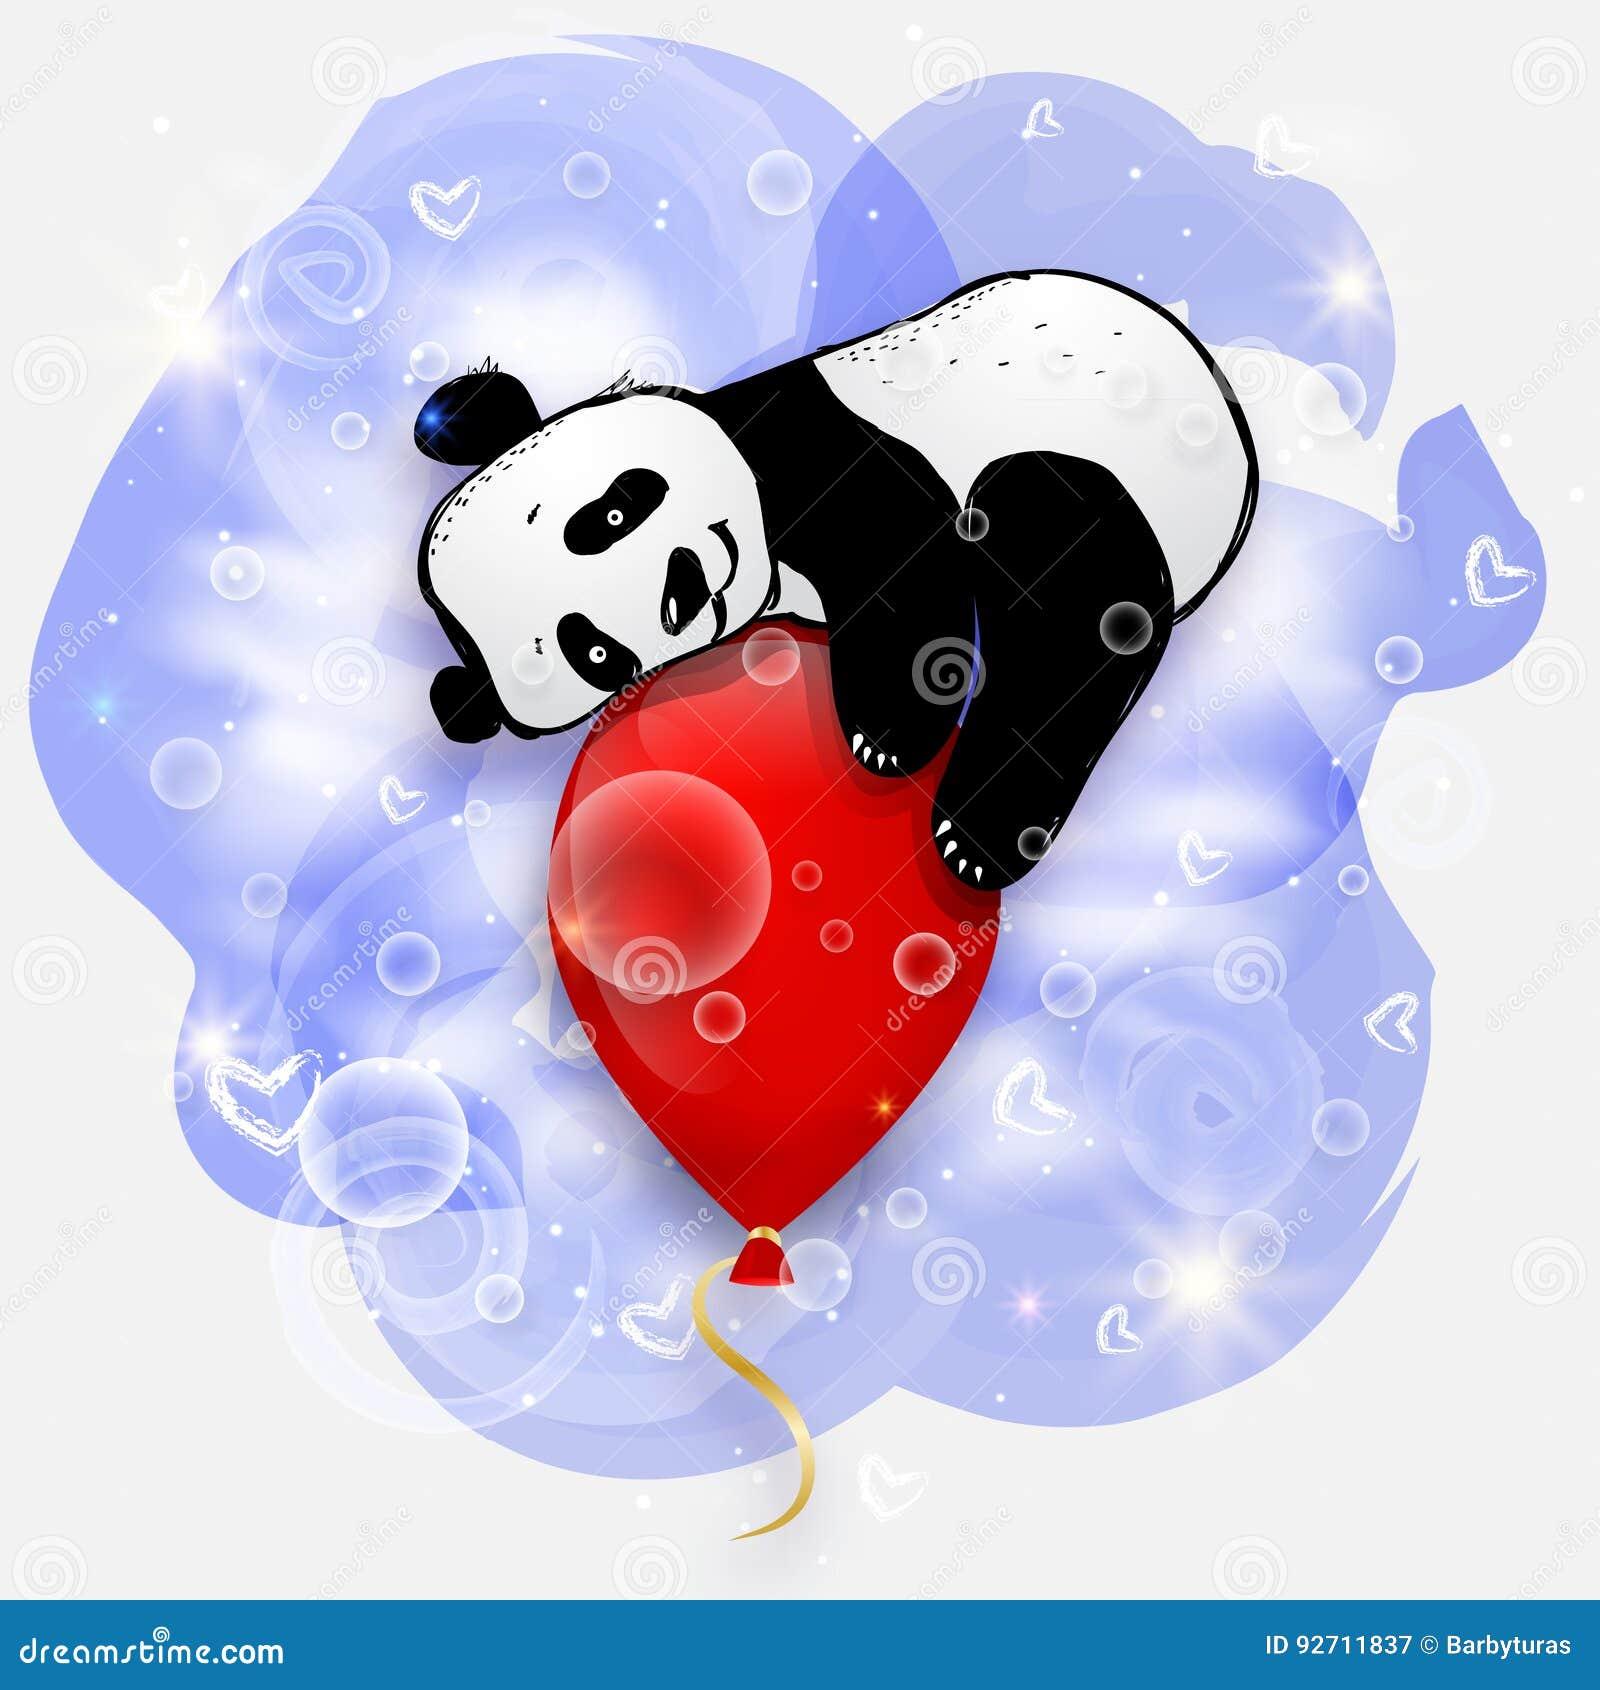 Cute little panda on red air balloon, birthday card illustration